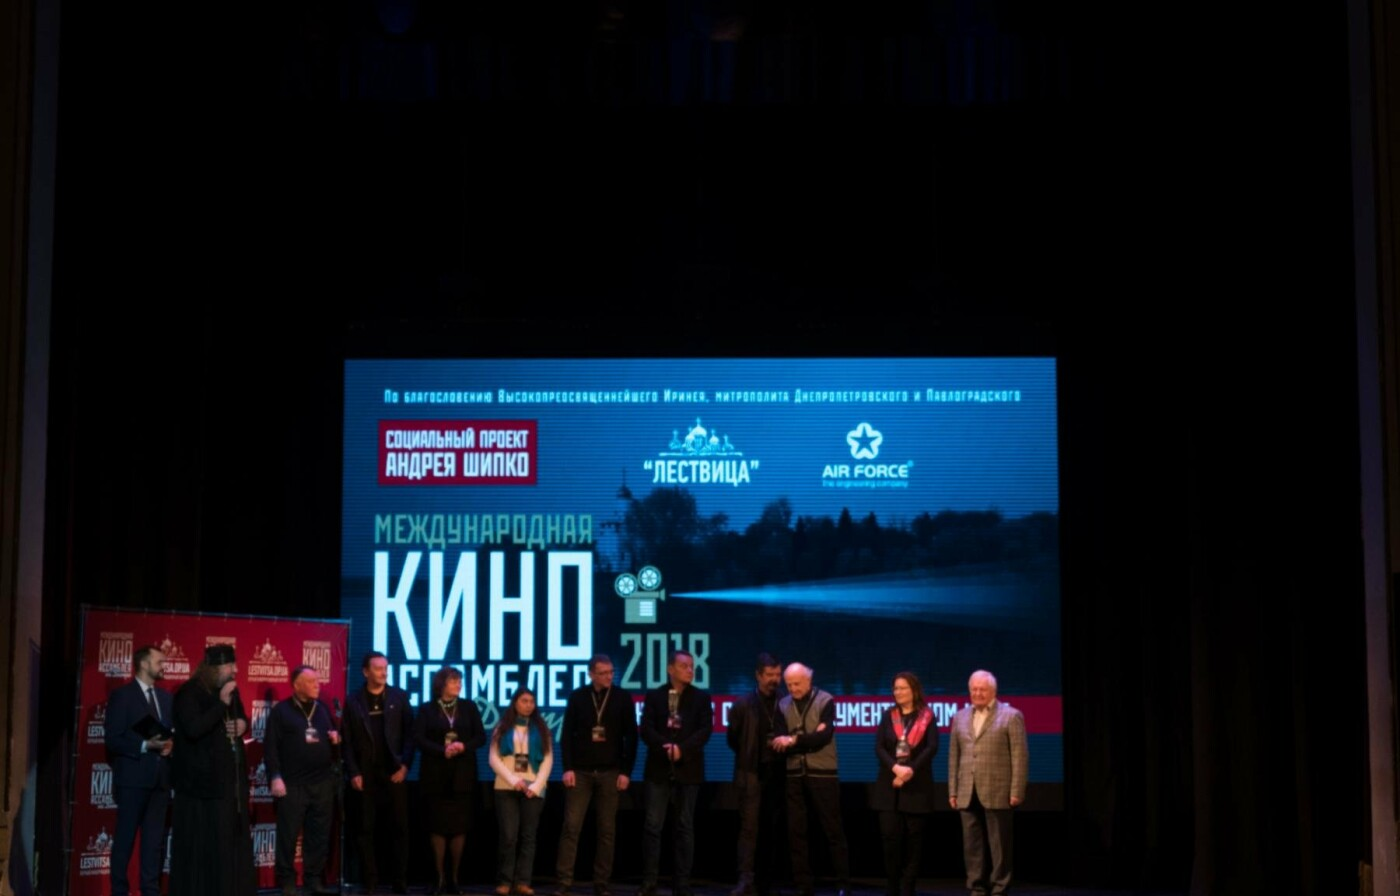 Киноассамблея на Днепре-2018: как прошла церемония открытия кинофорума (ФОТО), фото-1